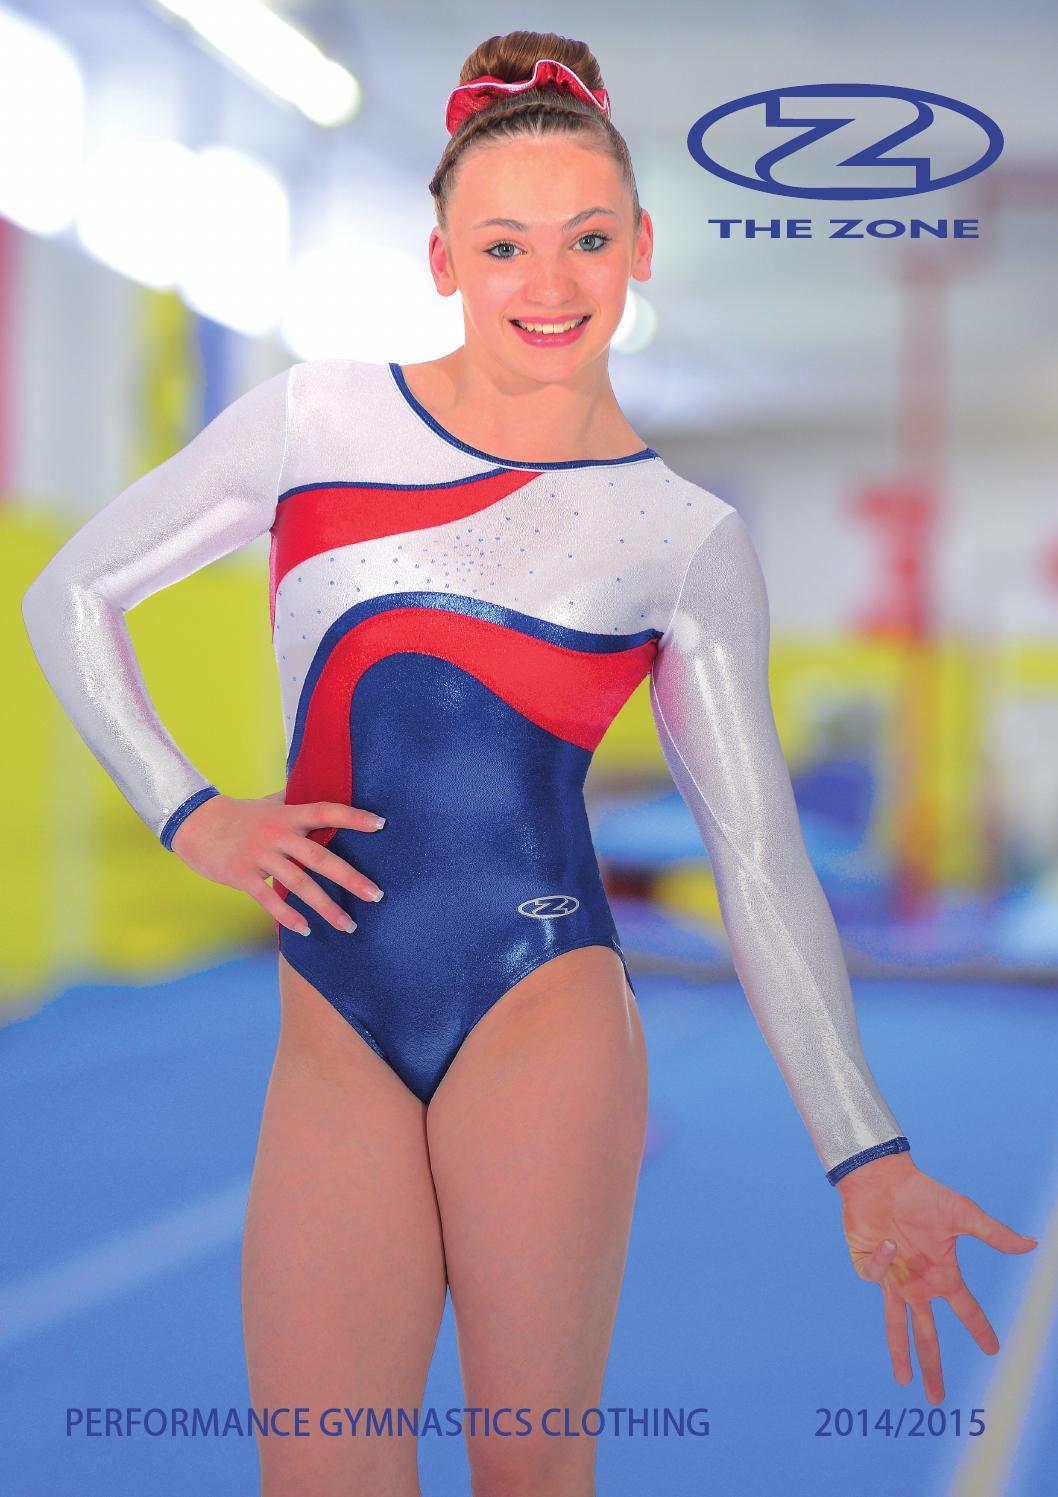 the zone gymnastics leotards gymnastics leotard